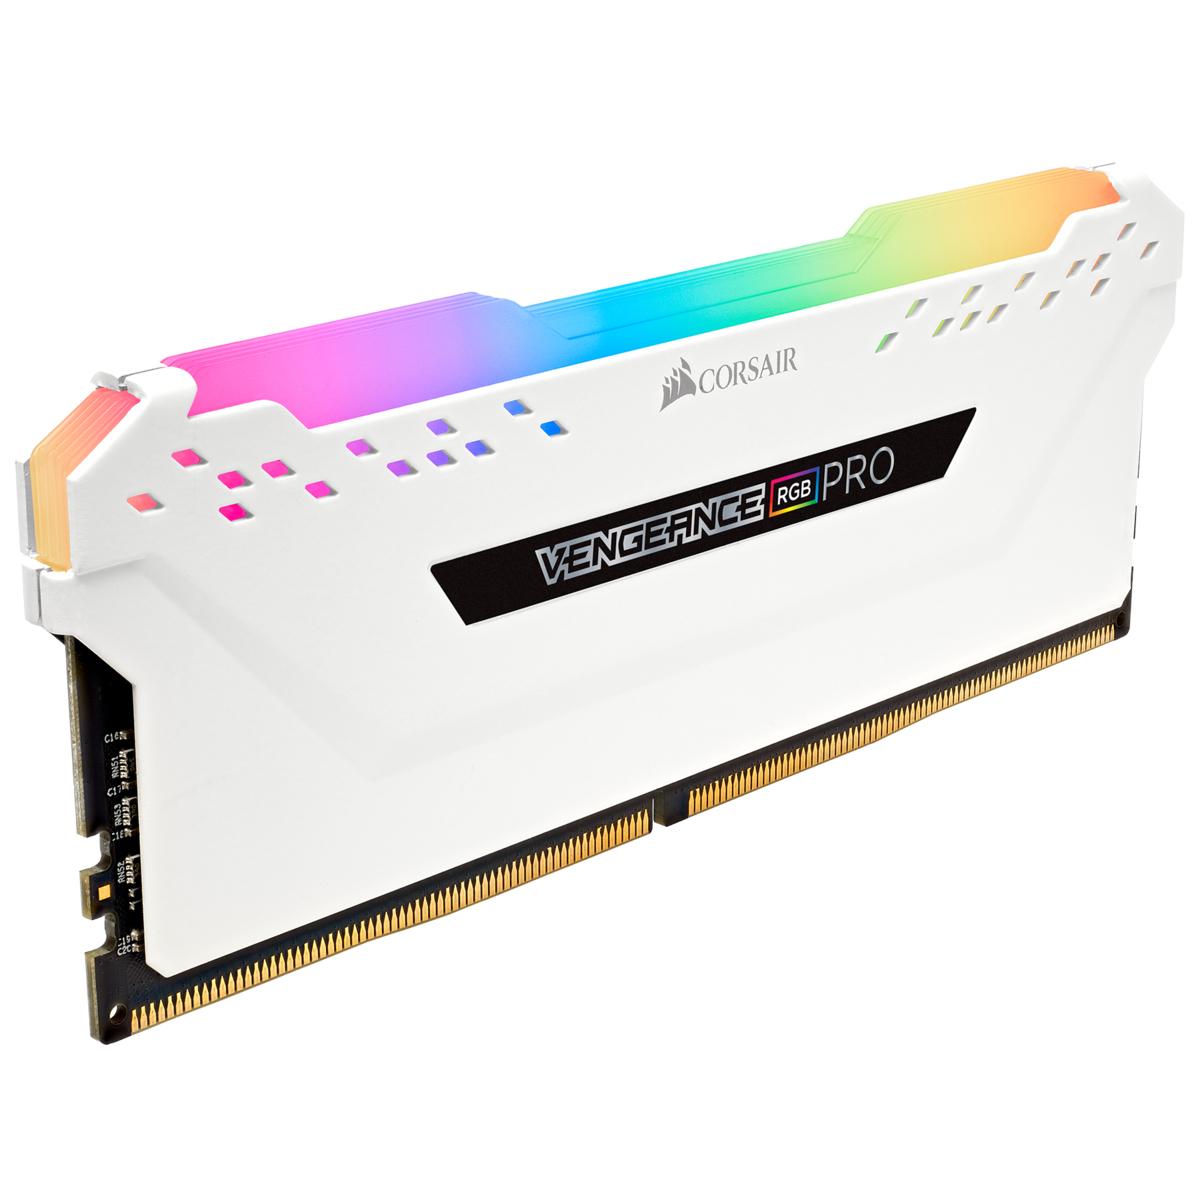 Corsair Vengeance RGB PRO - DDR4 - kit - 32 GB: 2 x 16 GB